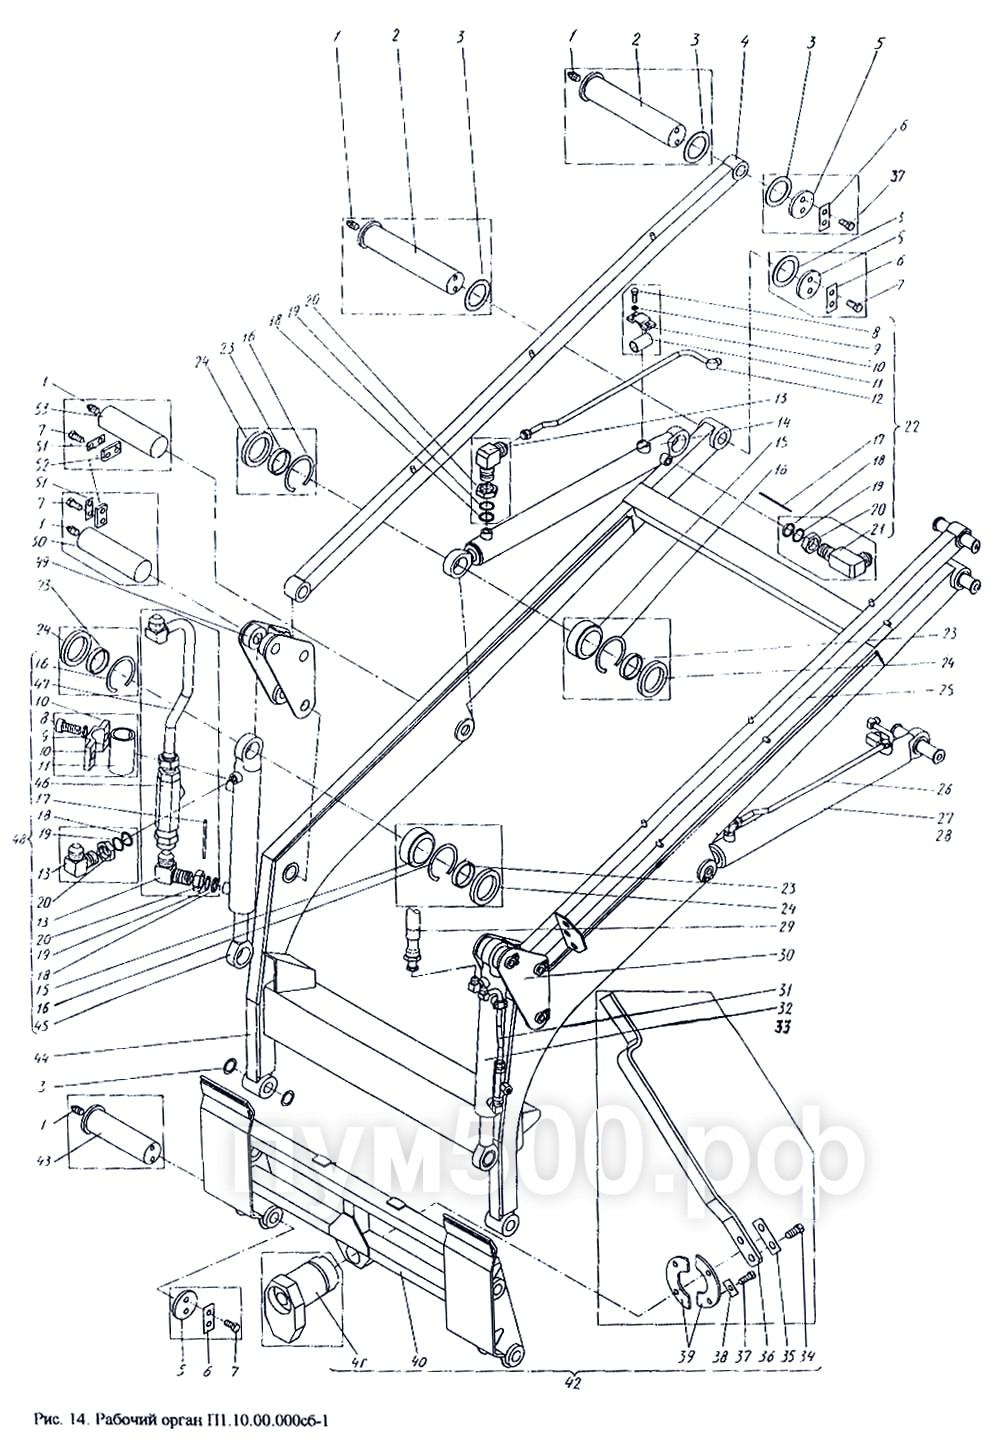 ПУМ-500 - Рабочий орган П1.10.00.000сб-1